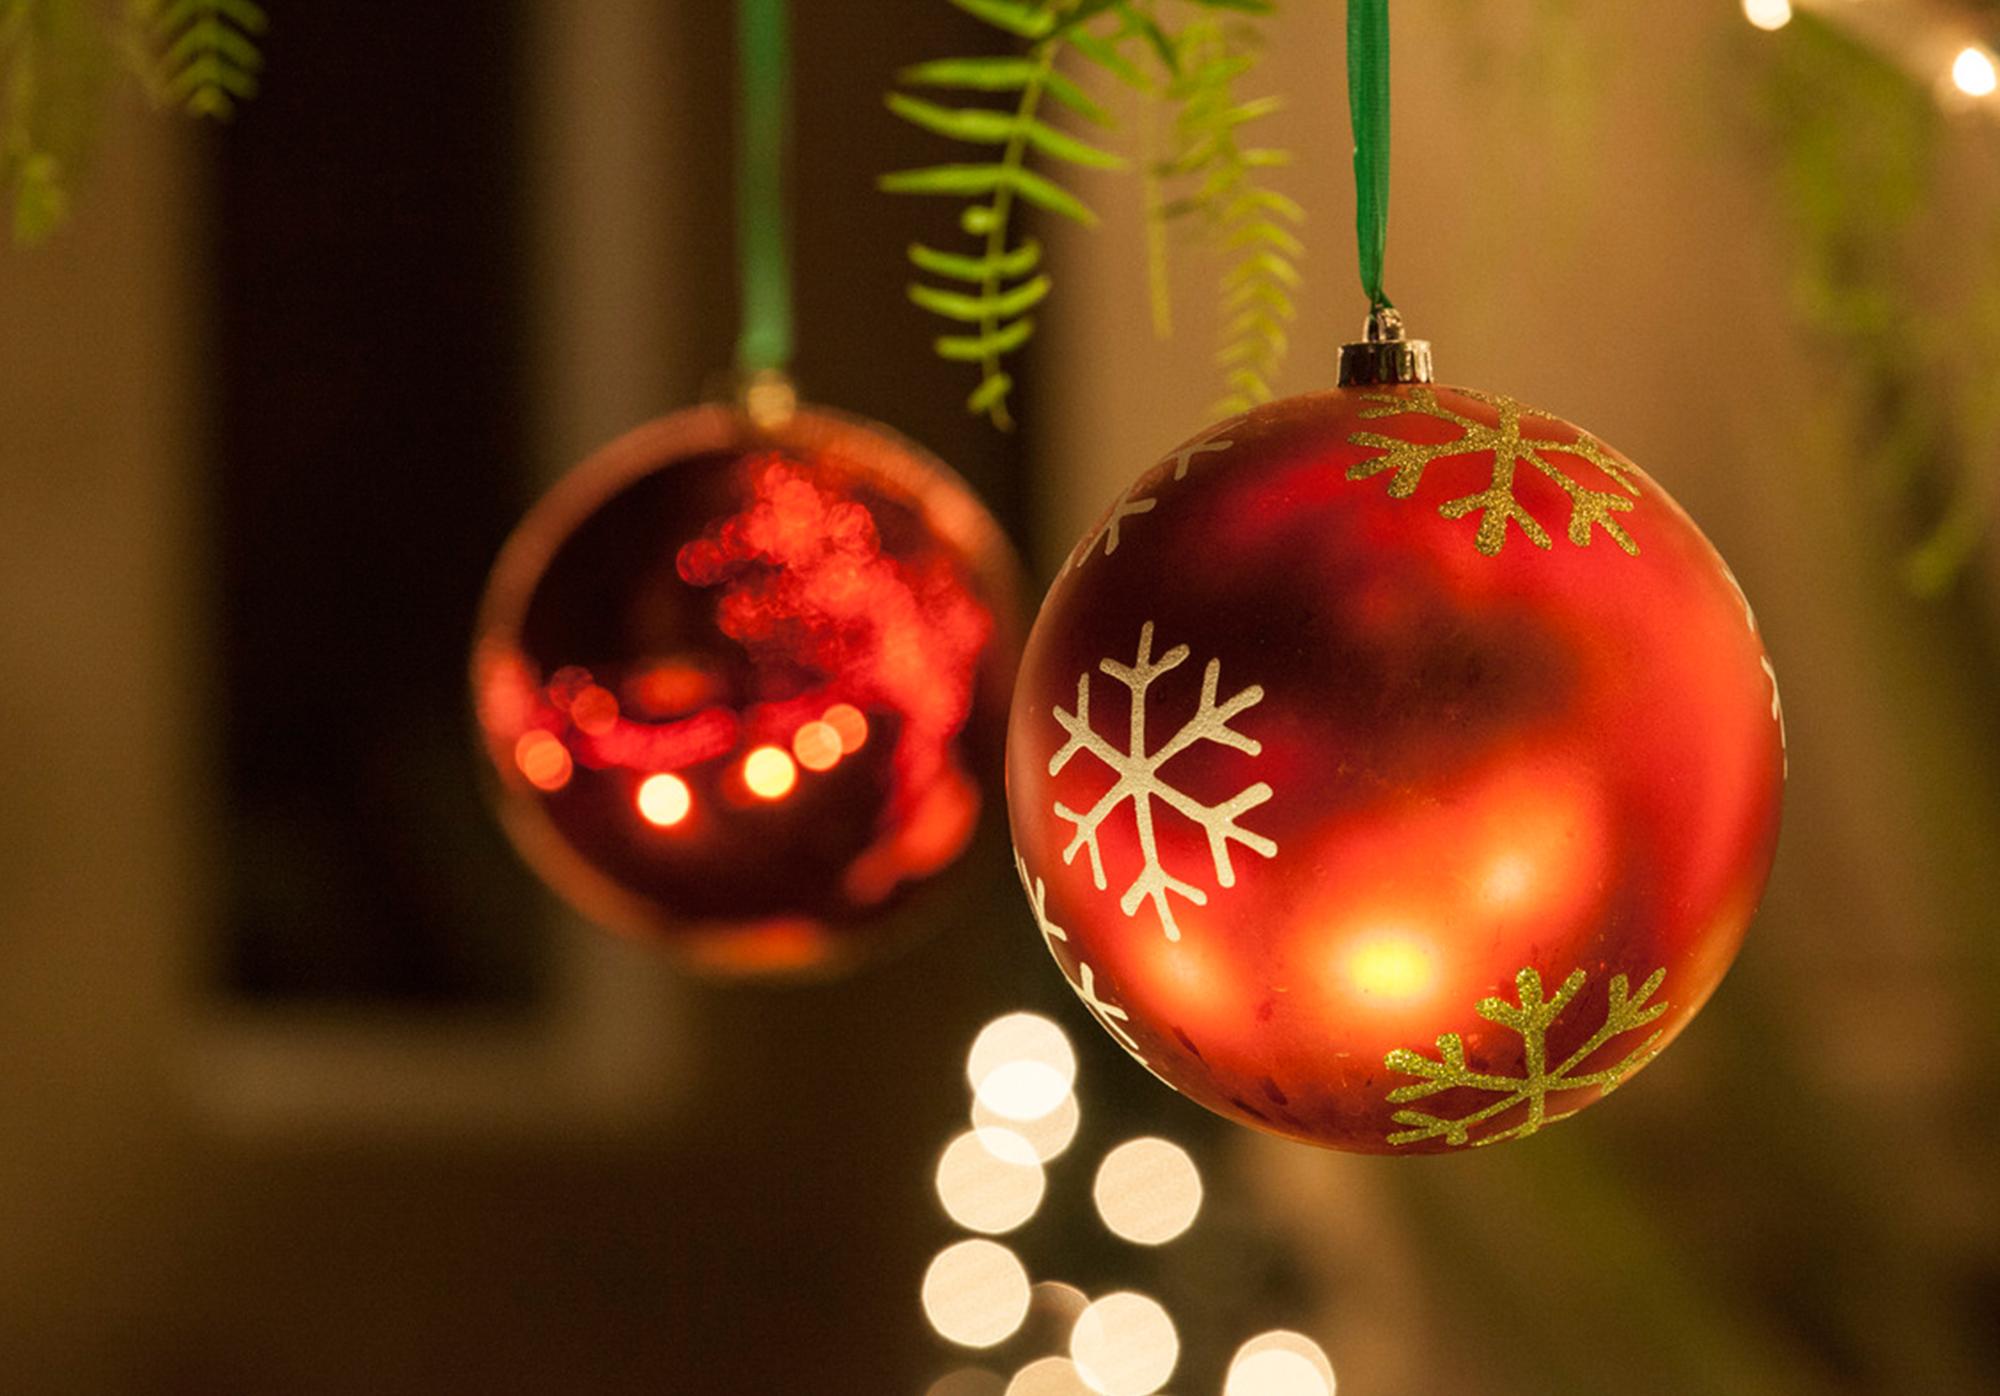 Creating A Multisensory Christmas Service